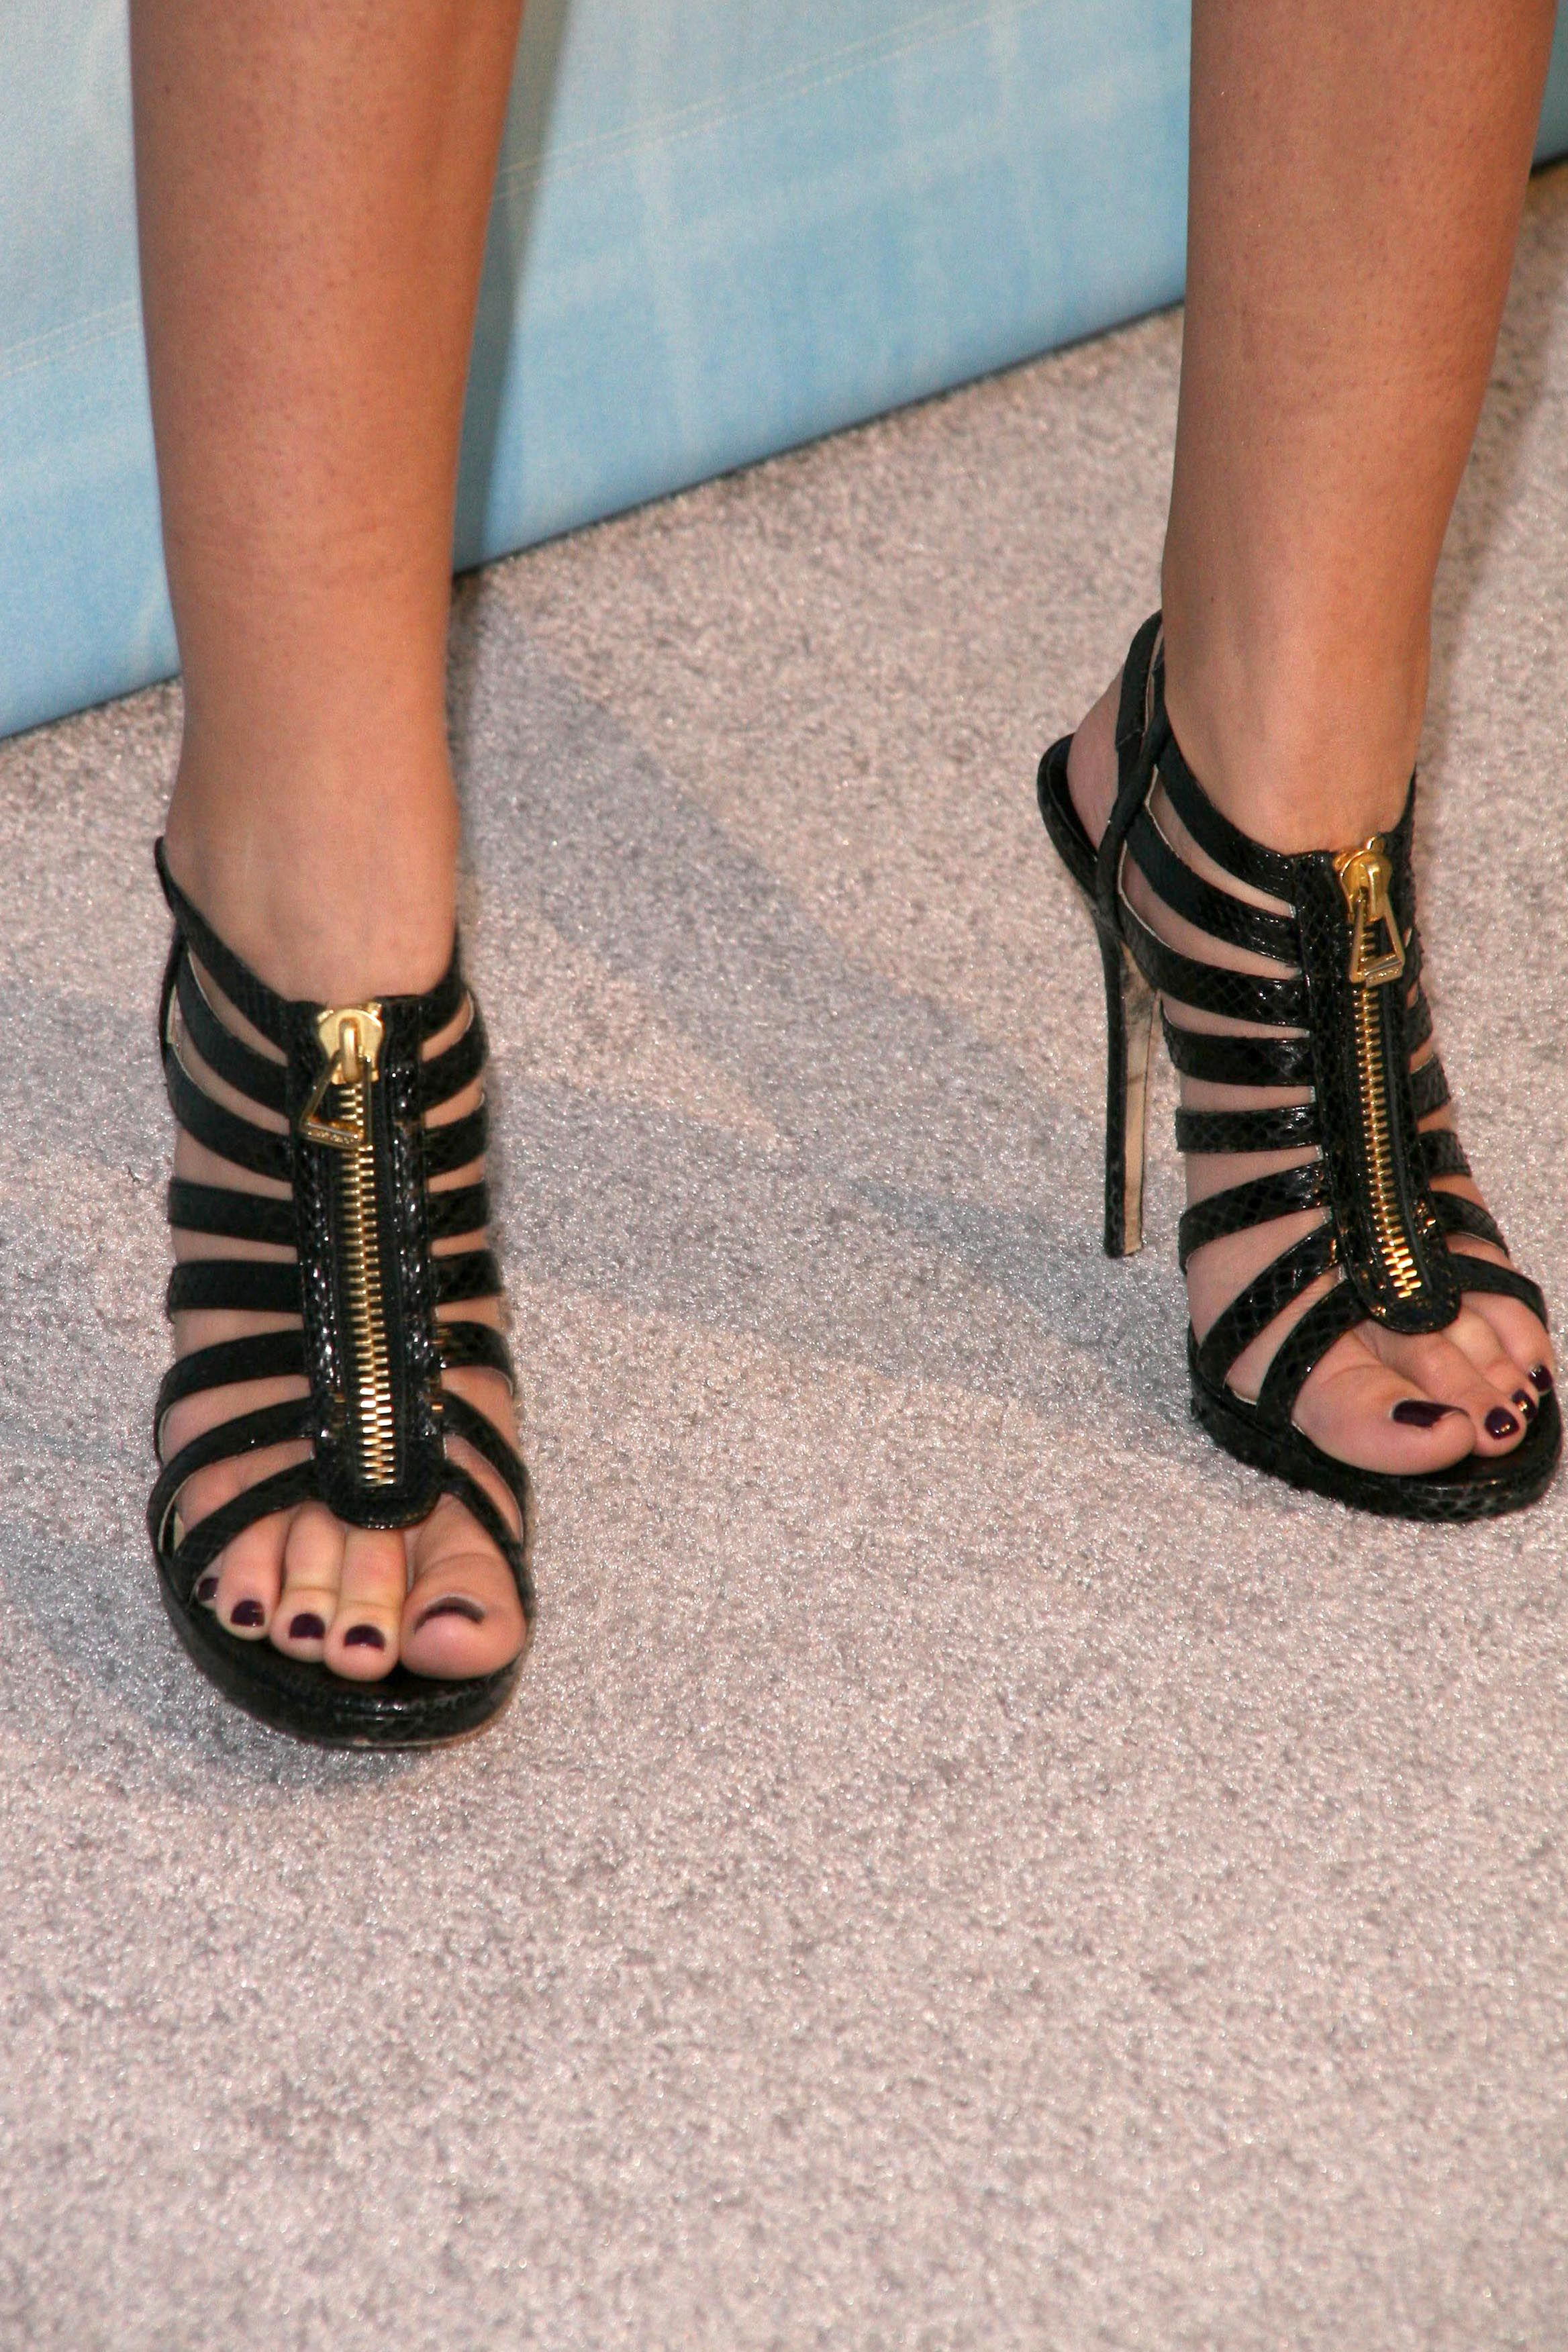 Long Slim Feet And Toes Black Multi Strap High Heels